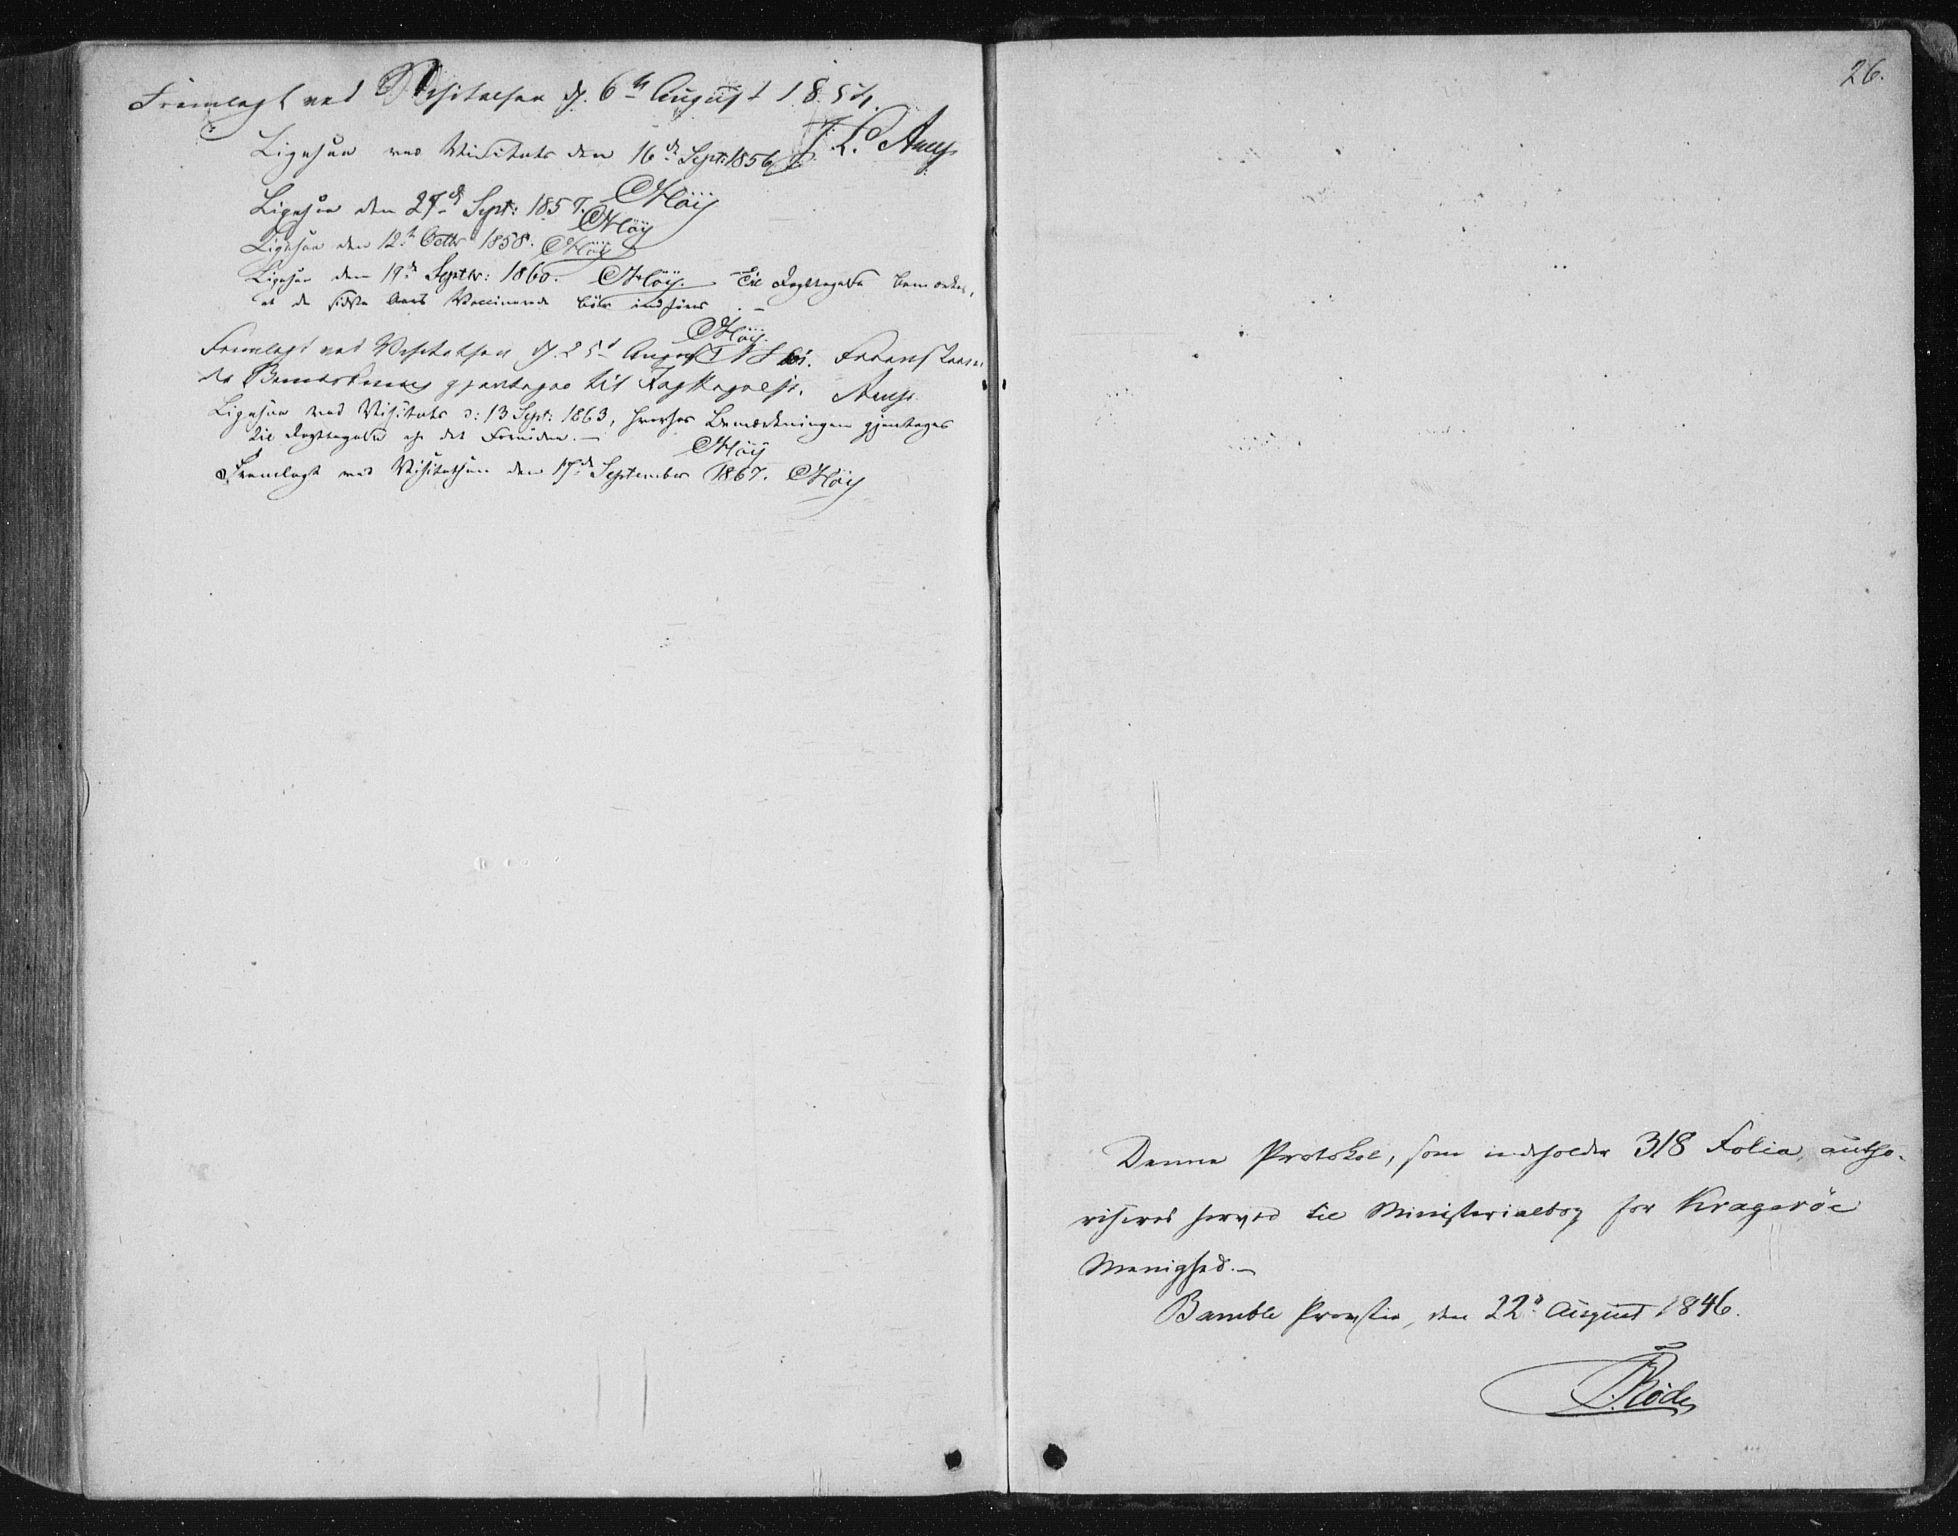 SAKO, Kragerø kirkebøker, F/Fa/L0006: Ministerialbok nr. 6, 1847-1861, s. 26